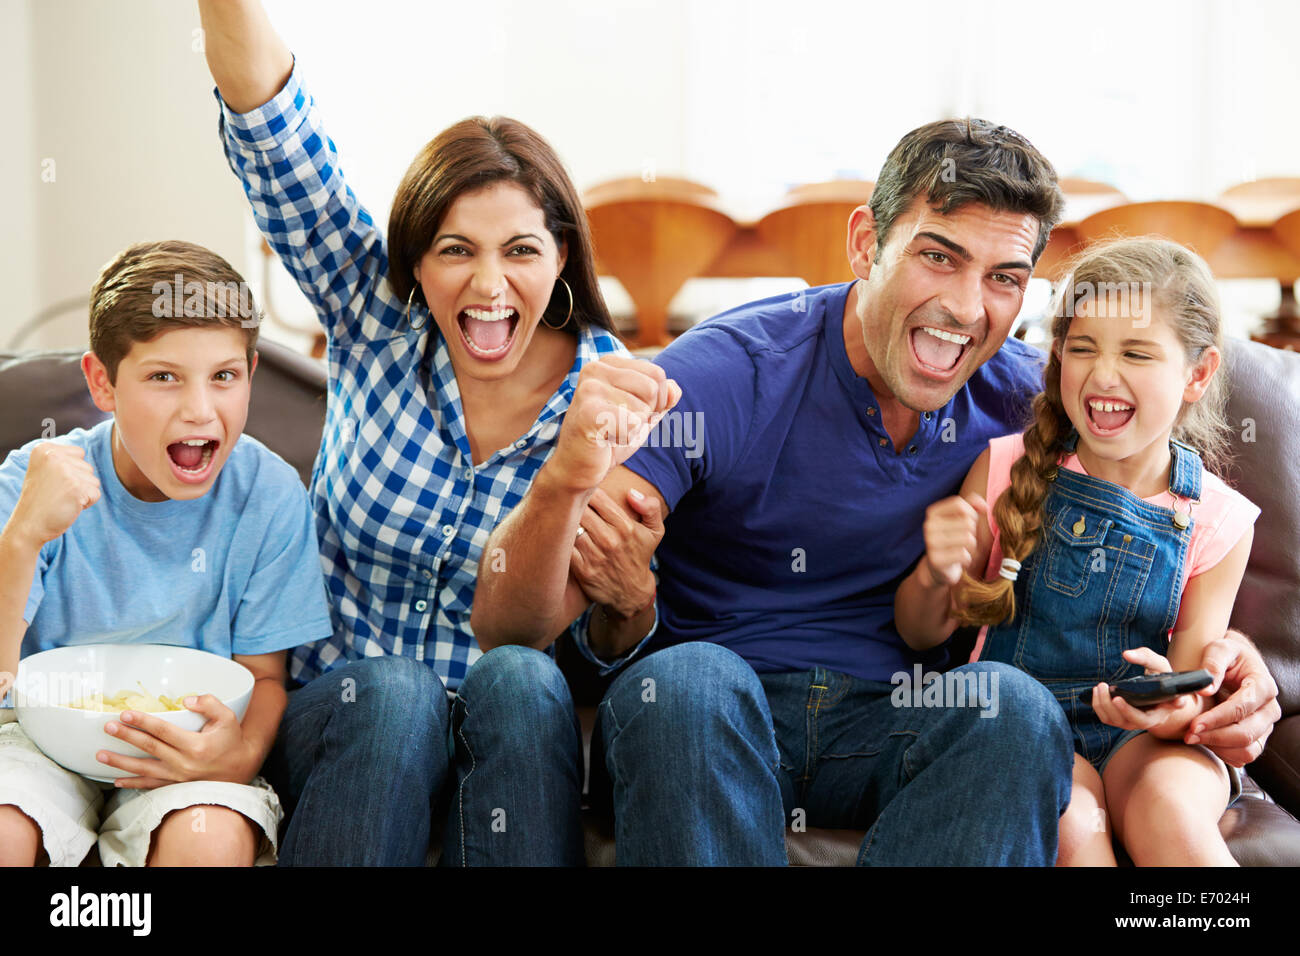 Family Watching Soccer Celebrating Goal - Stock Image